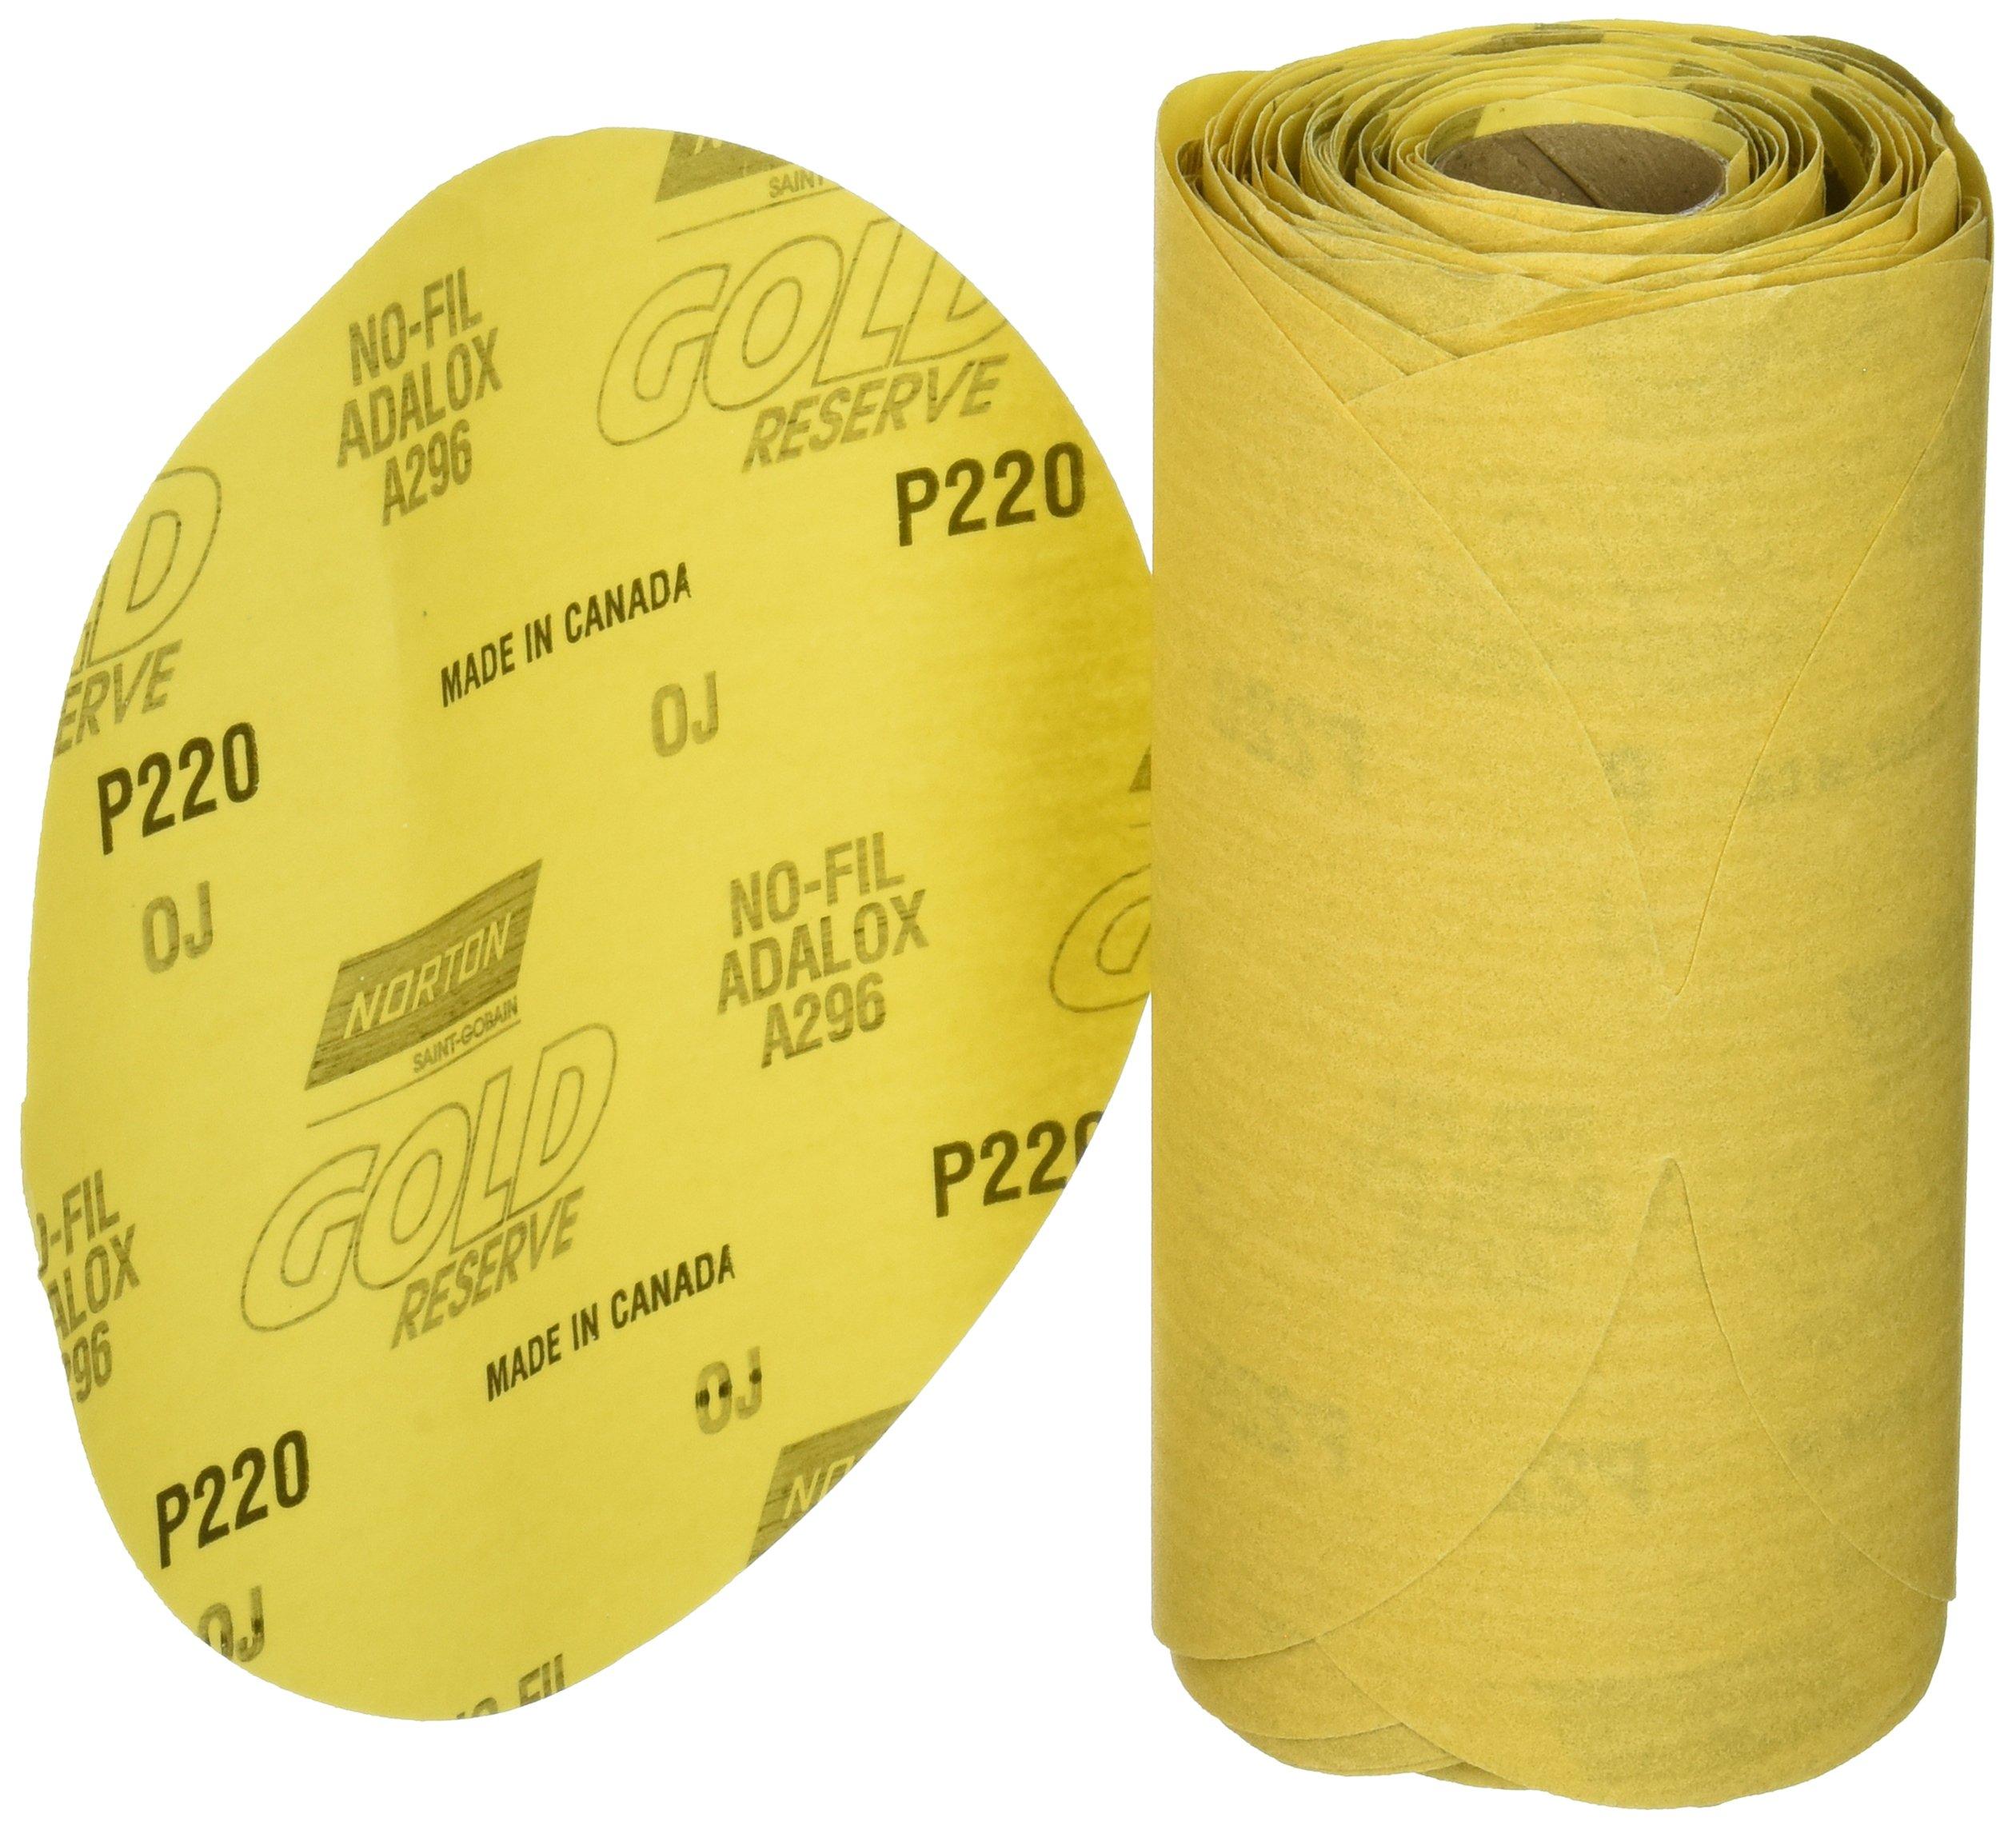 Norton 662611-83820 Gold Reserve 6'' P220B PSA Disc Roll, (100 Discs/Roll)